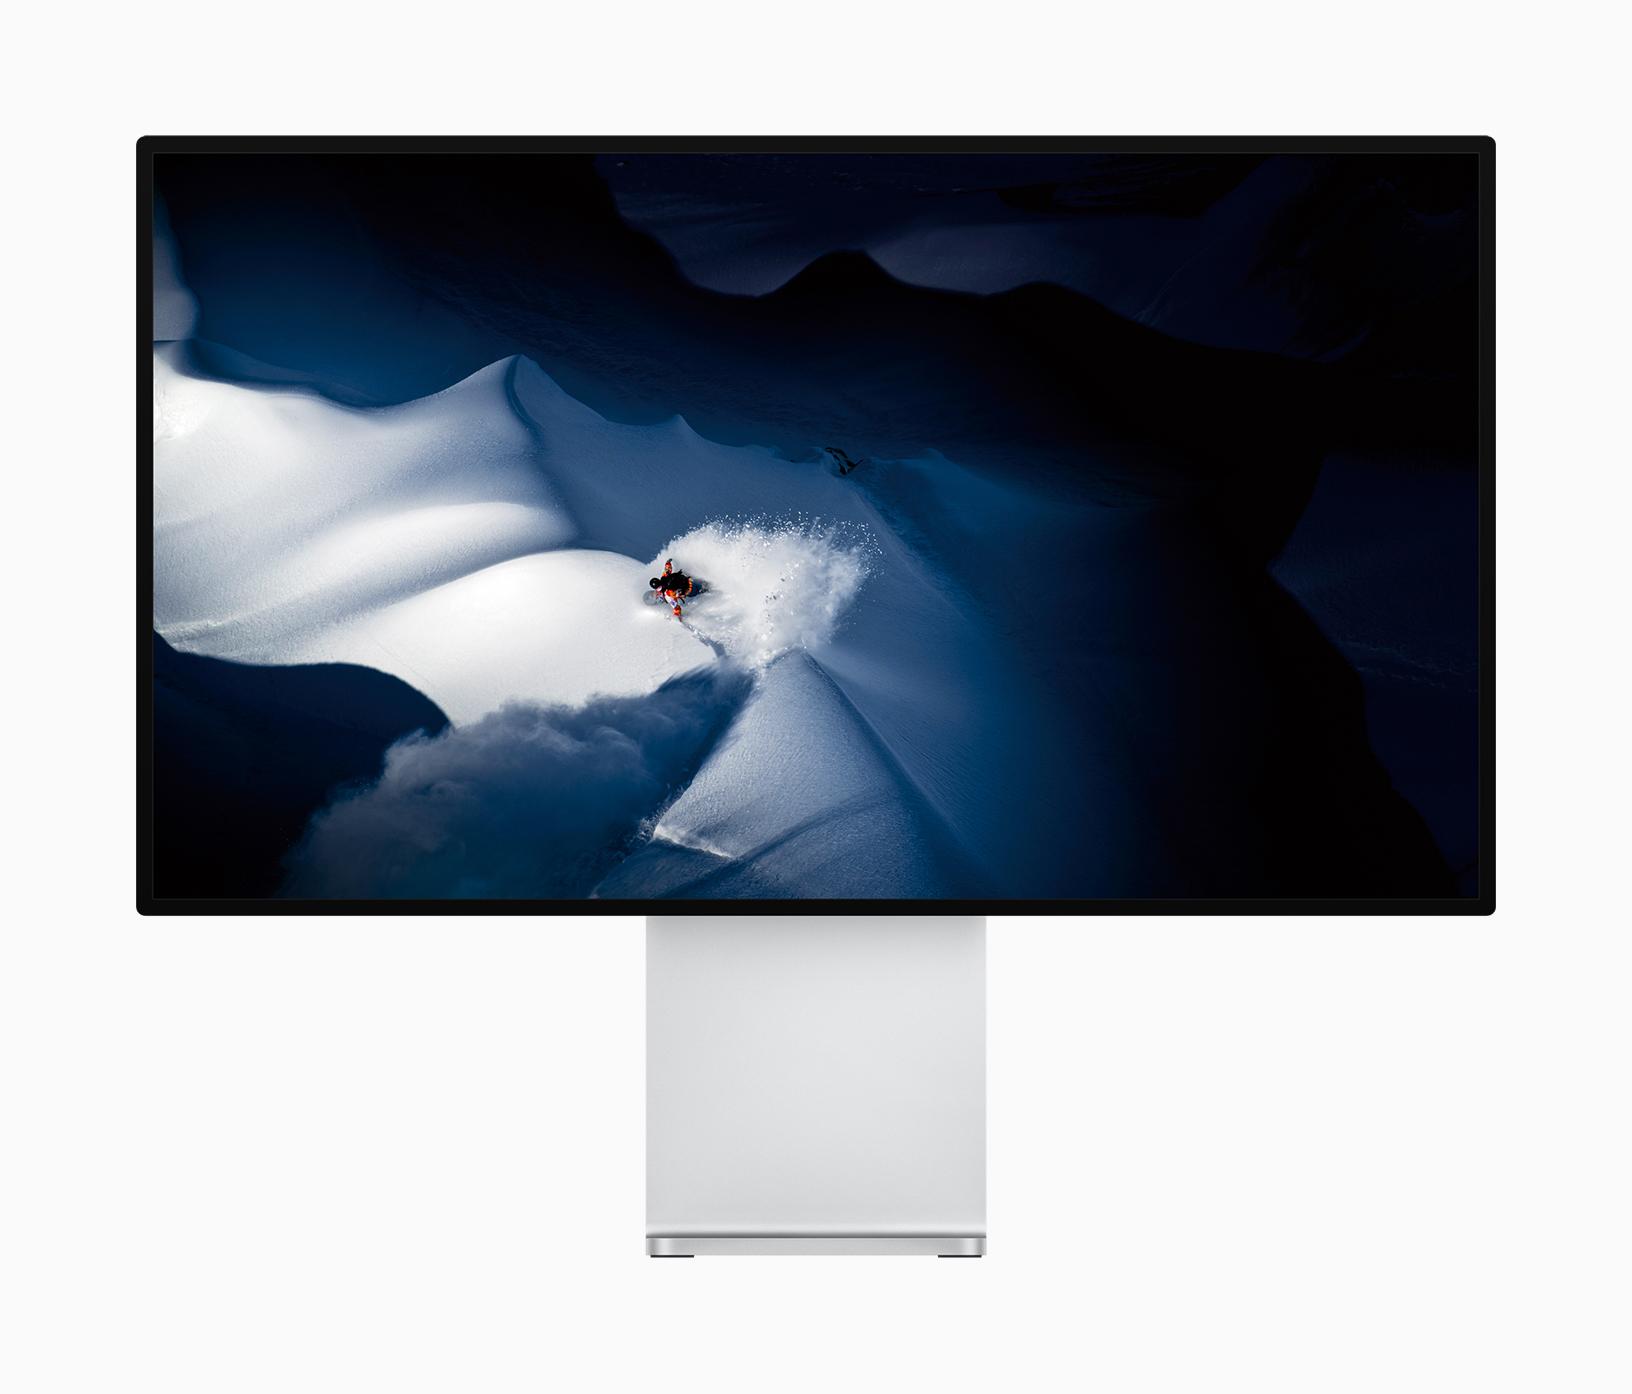 Apple_Mac-Pro-Display-Pro_Display-Pro-Brightness_060319.jpg